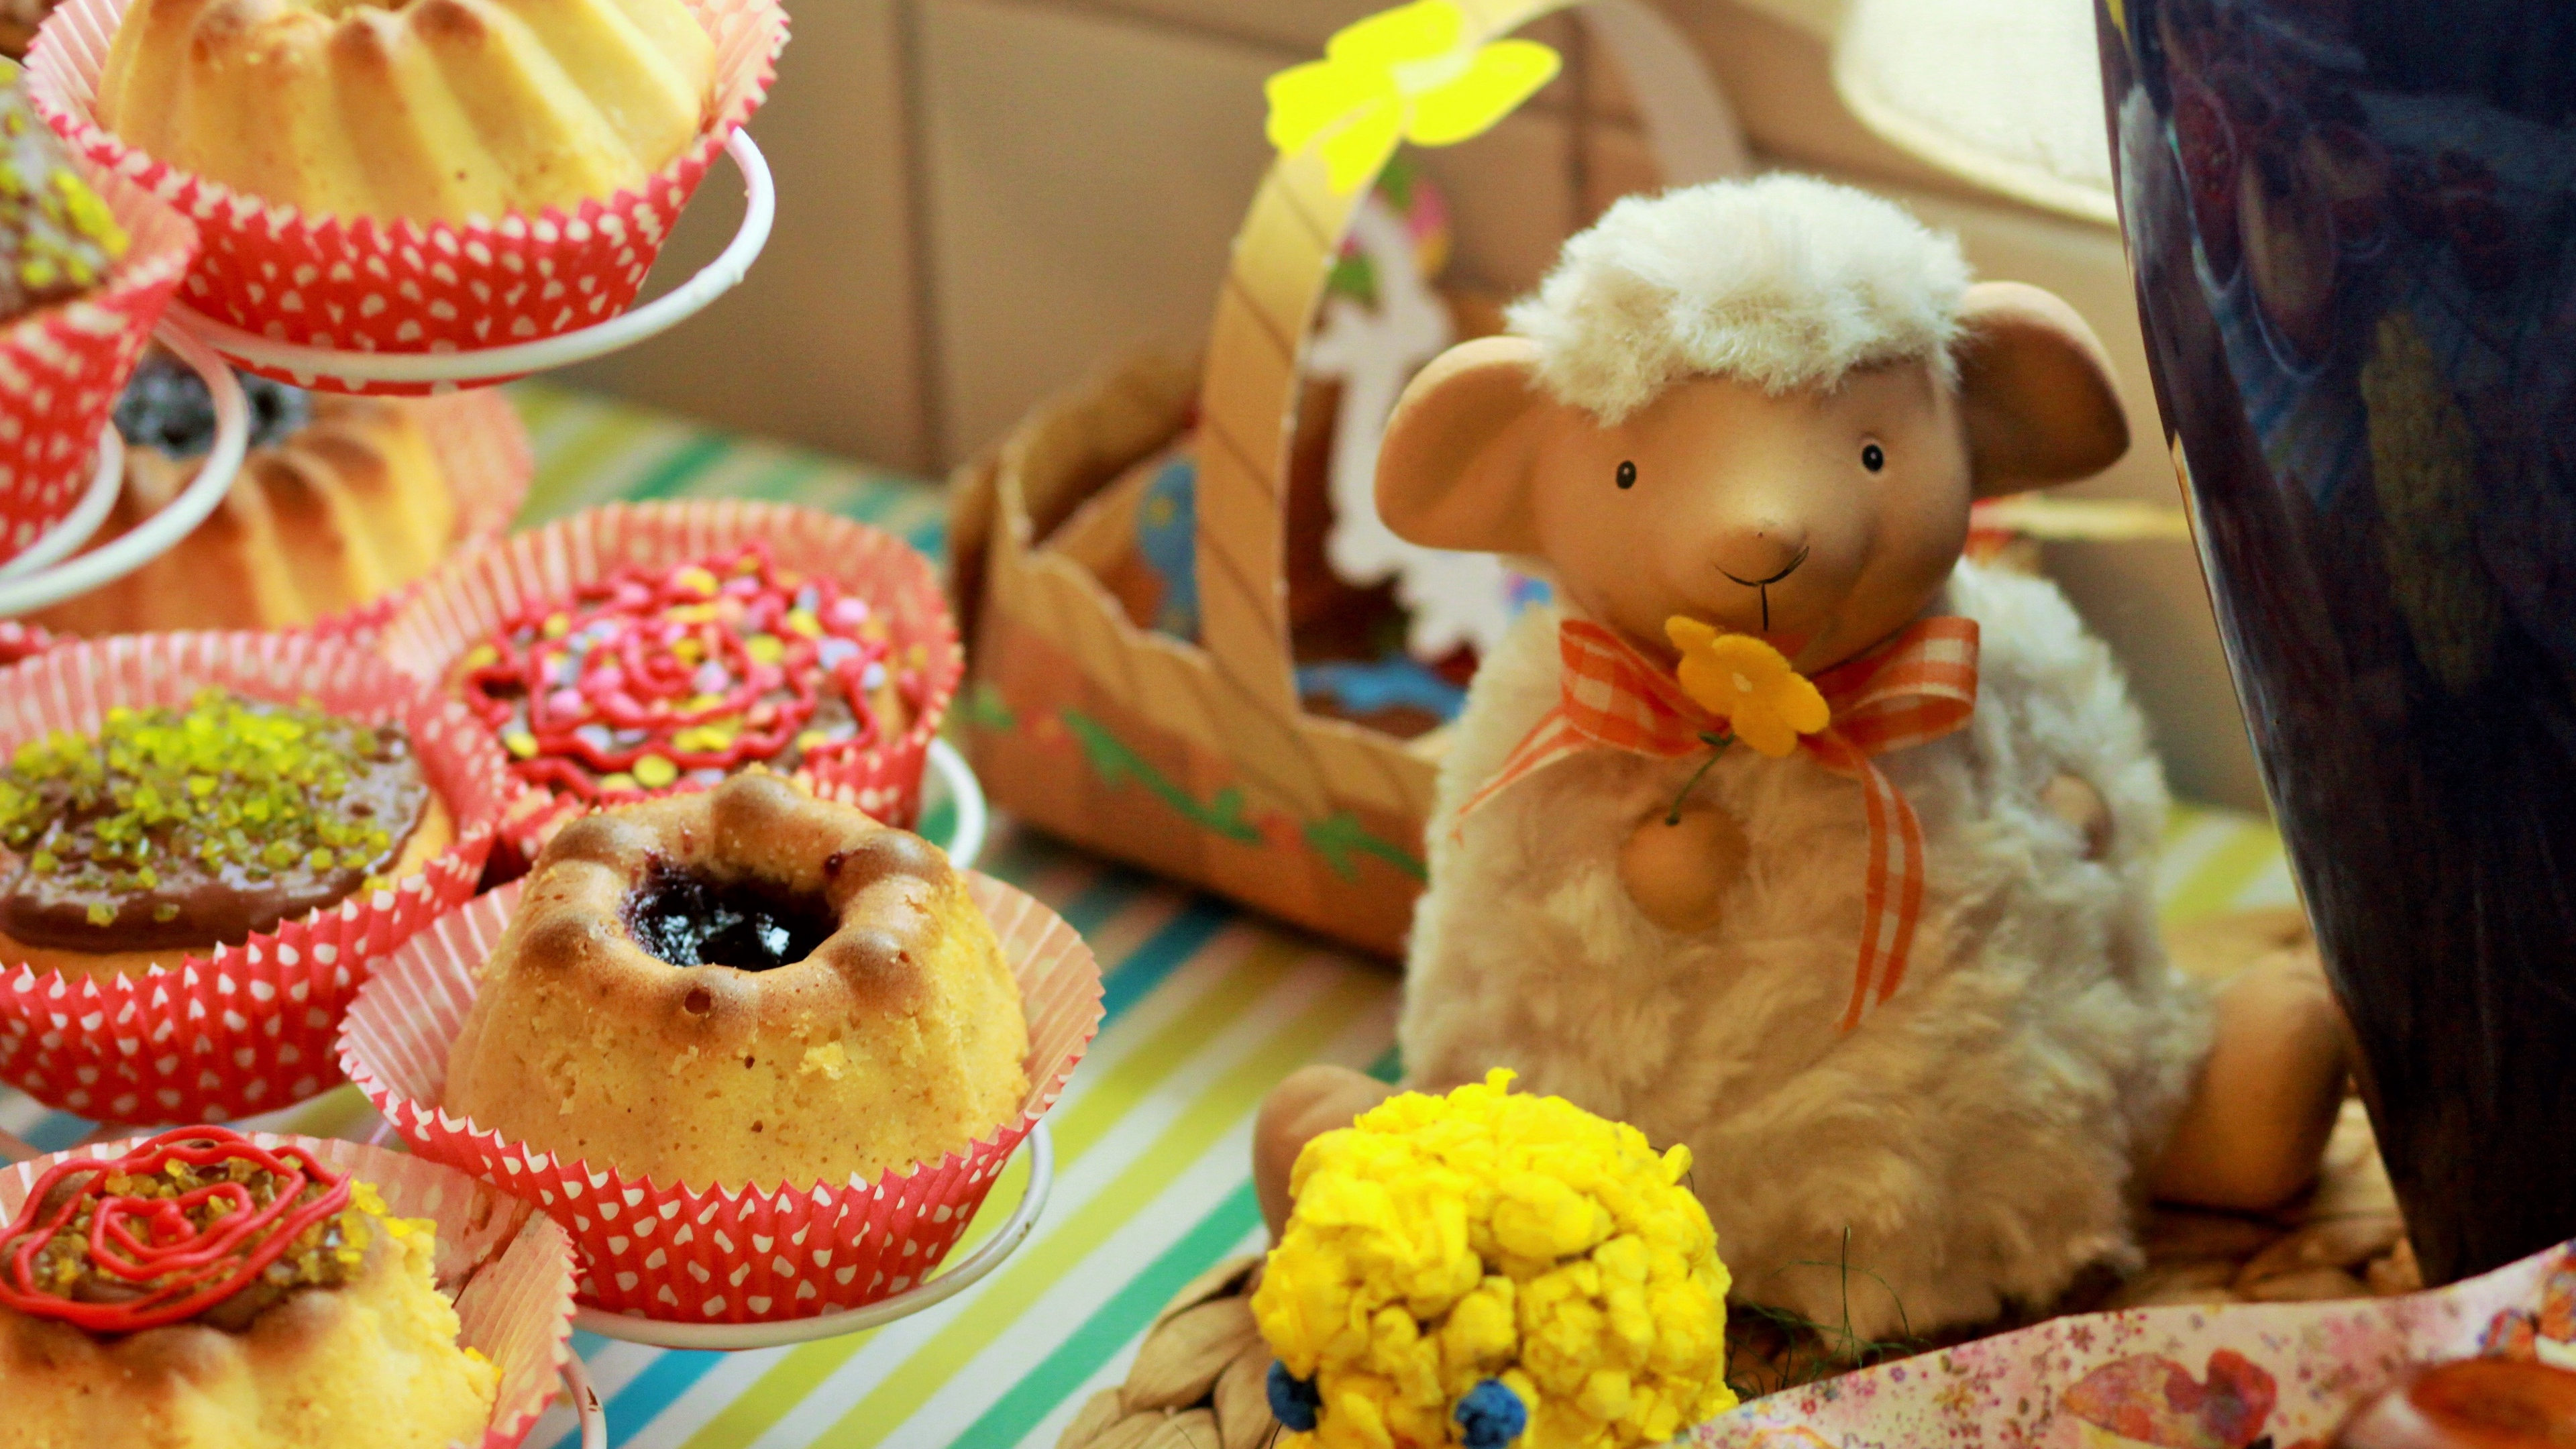 easter cake holiday lamb baked 4k 1538345123 - easter, cake, holiday, lamb, baked 4k - Holiday, Easter, cake